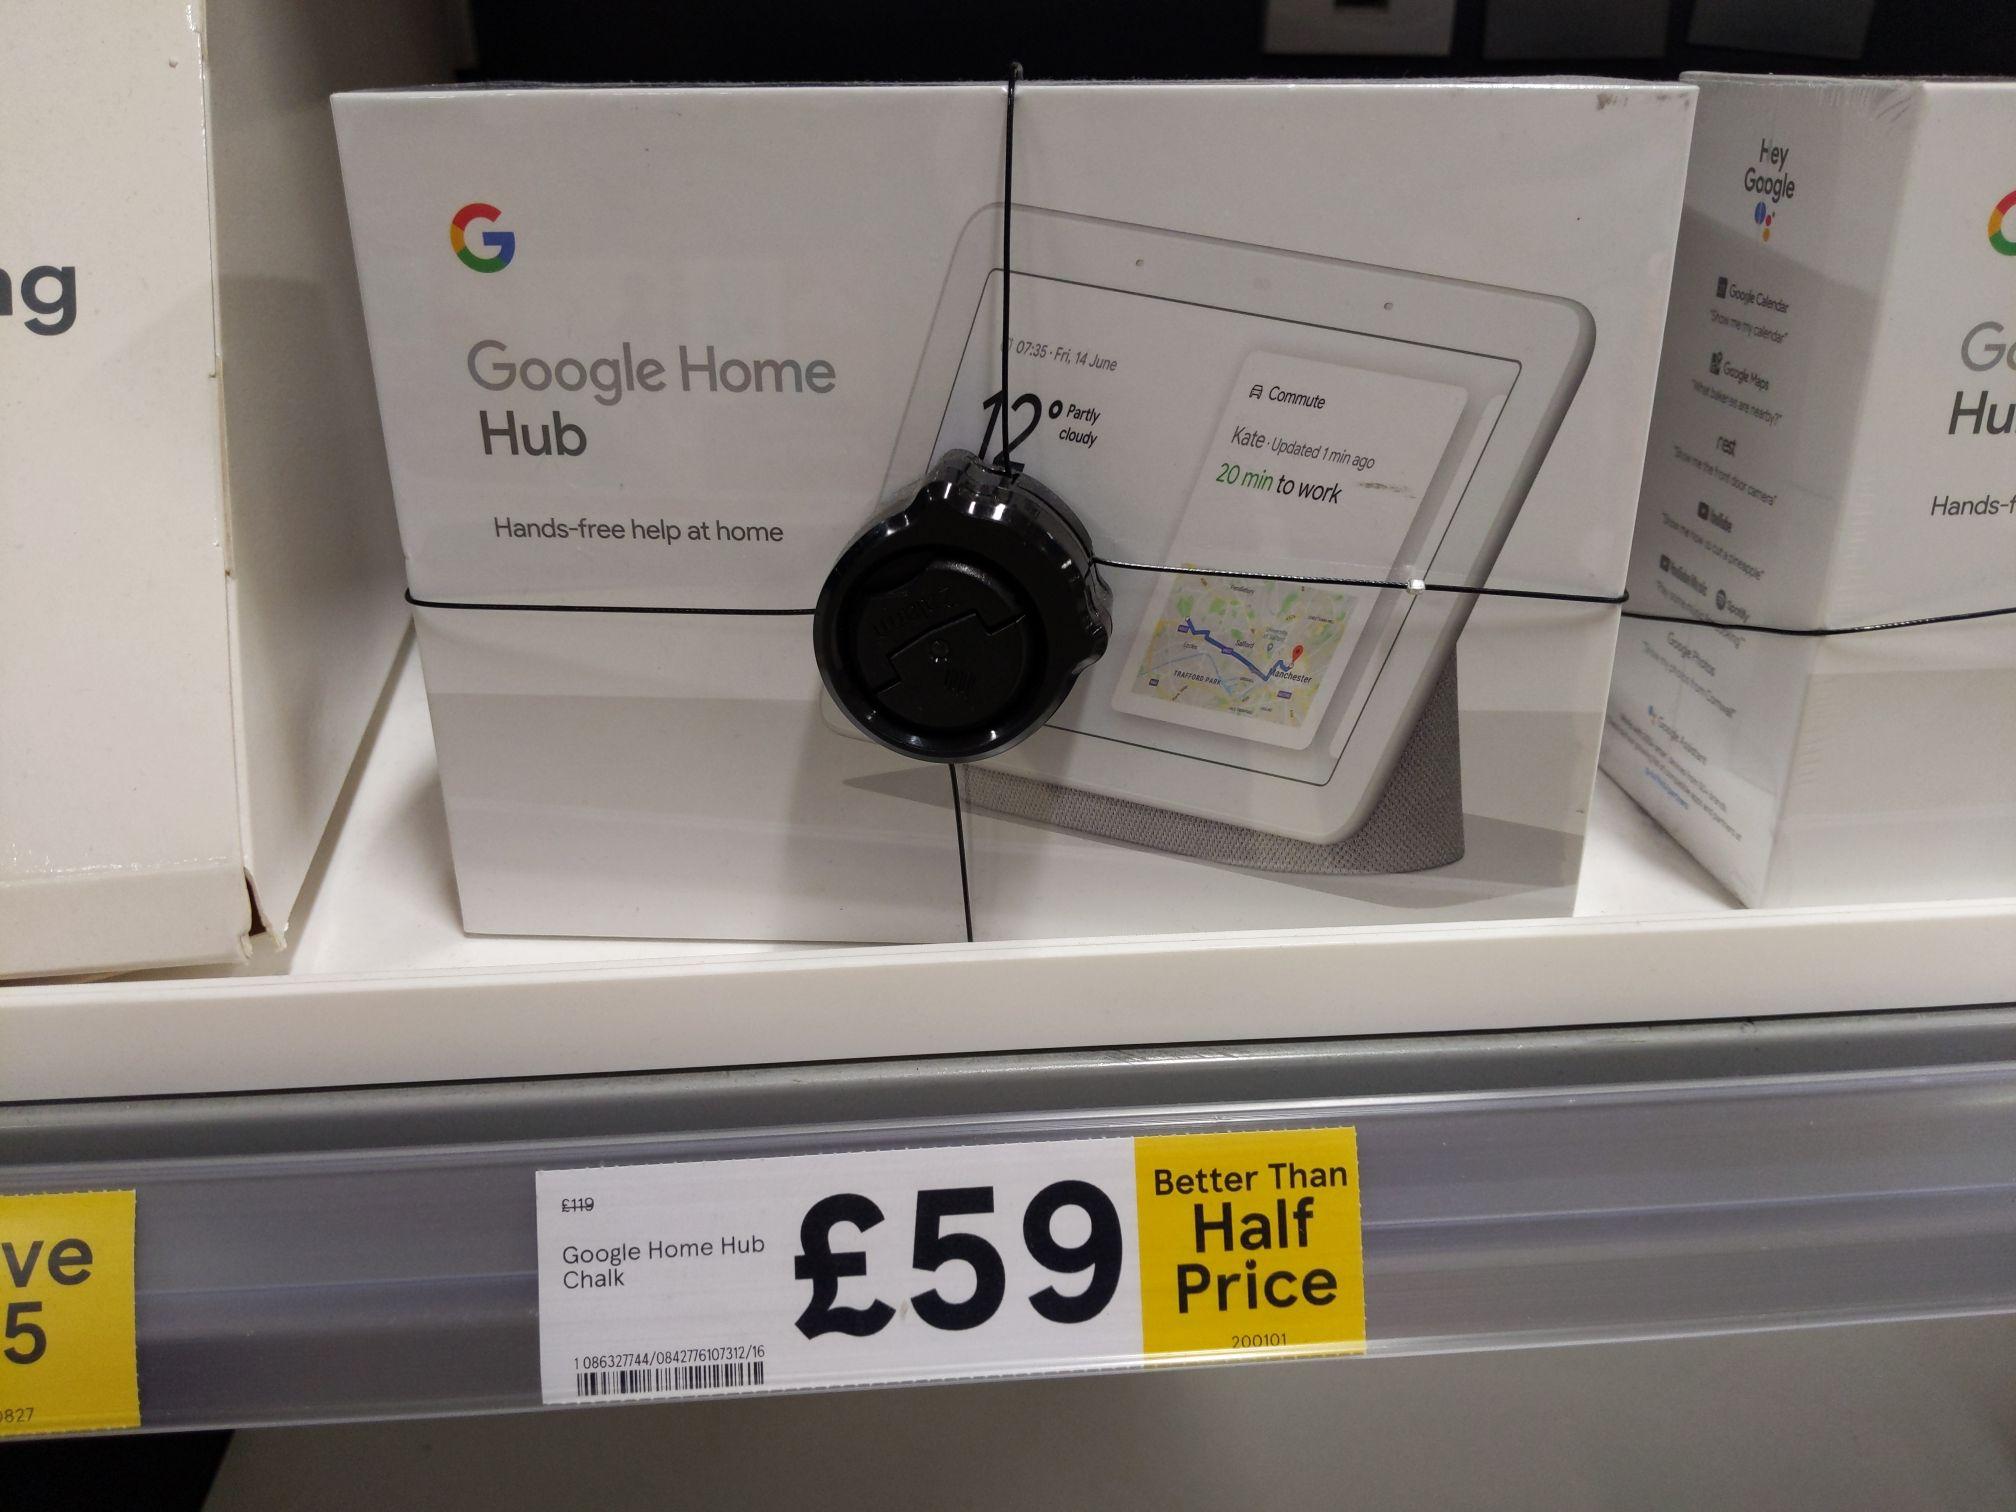 Google Home Hub £59 Tesco Carrickfergus, (Model number GA00516-GB)